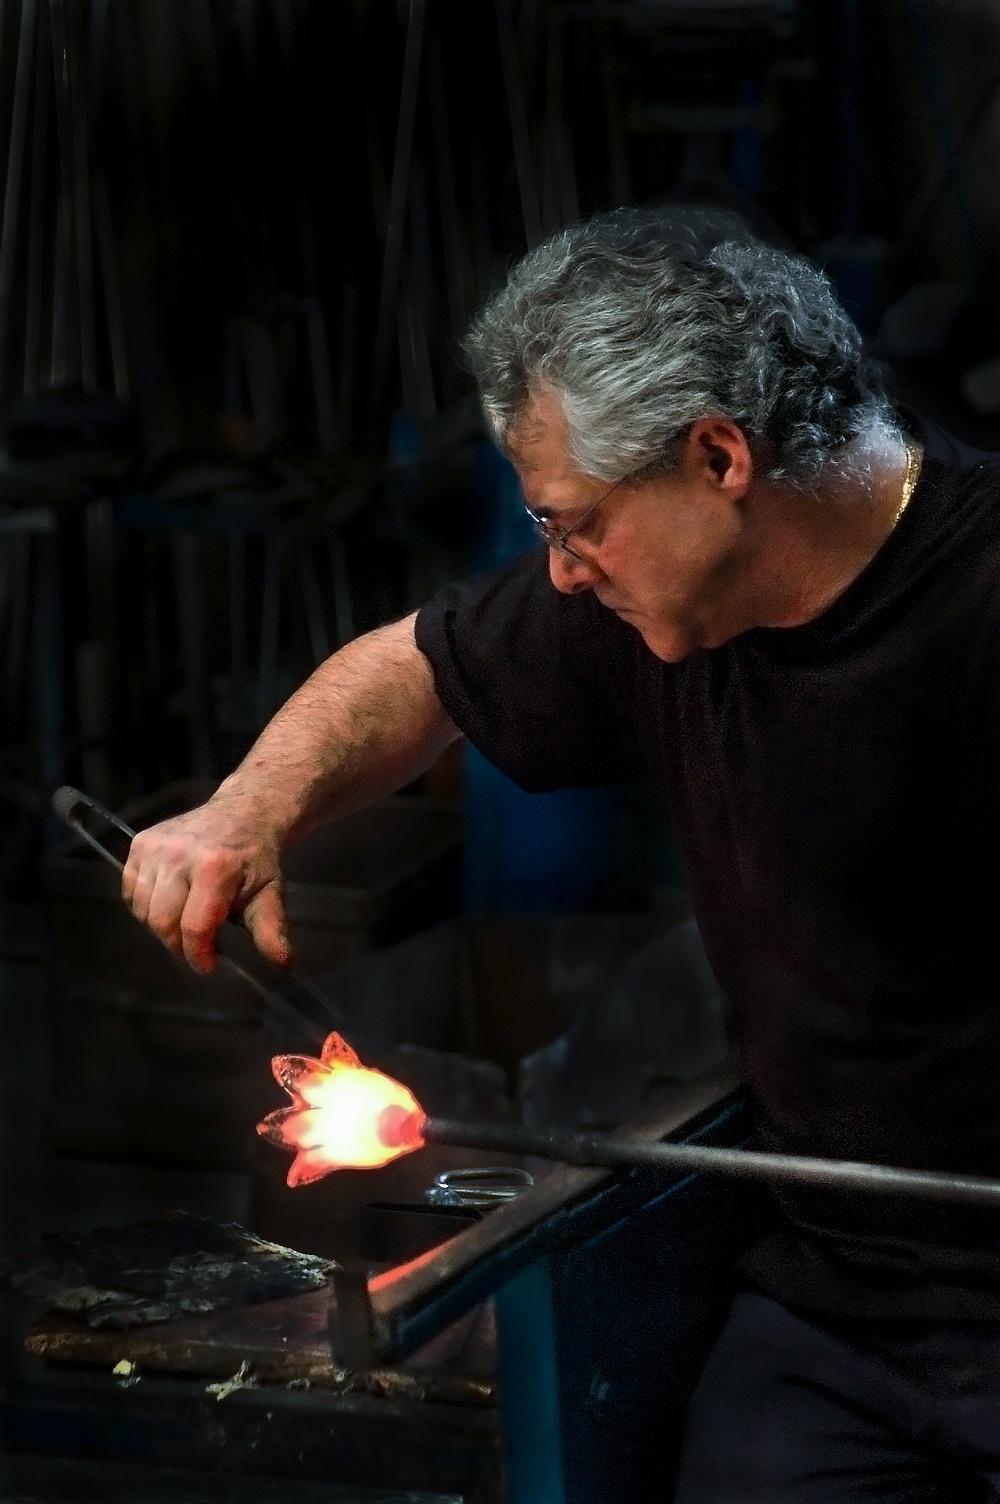 Glass maker, Poble espanyol, Barcelona by Chris Panagiotidis